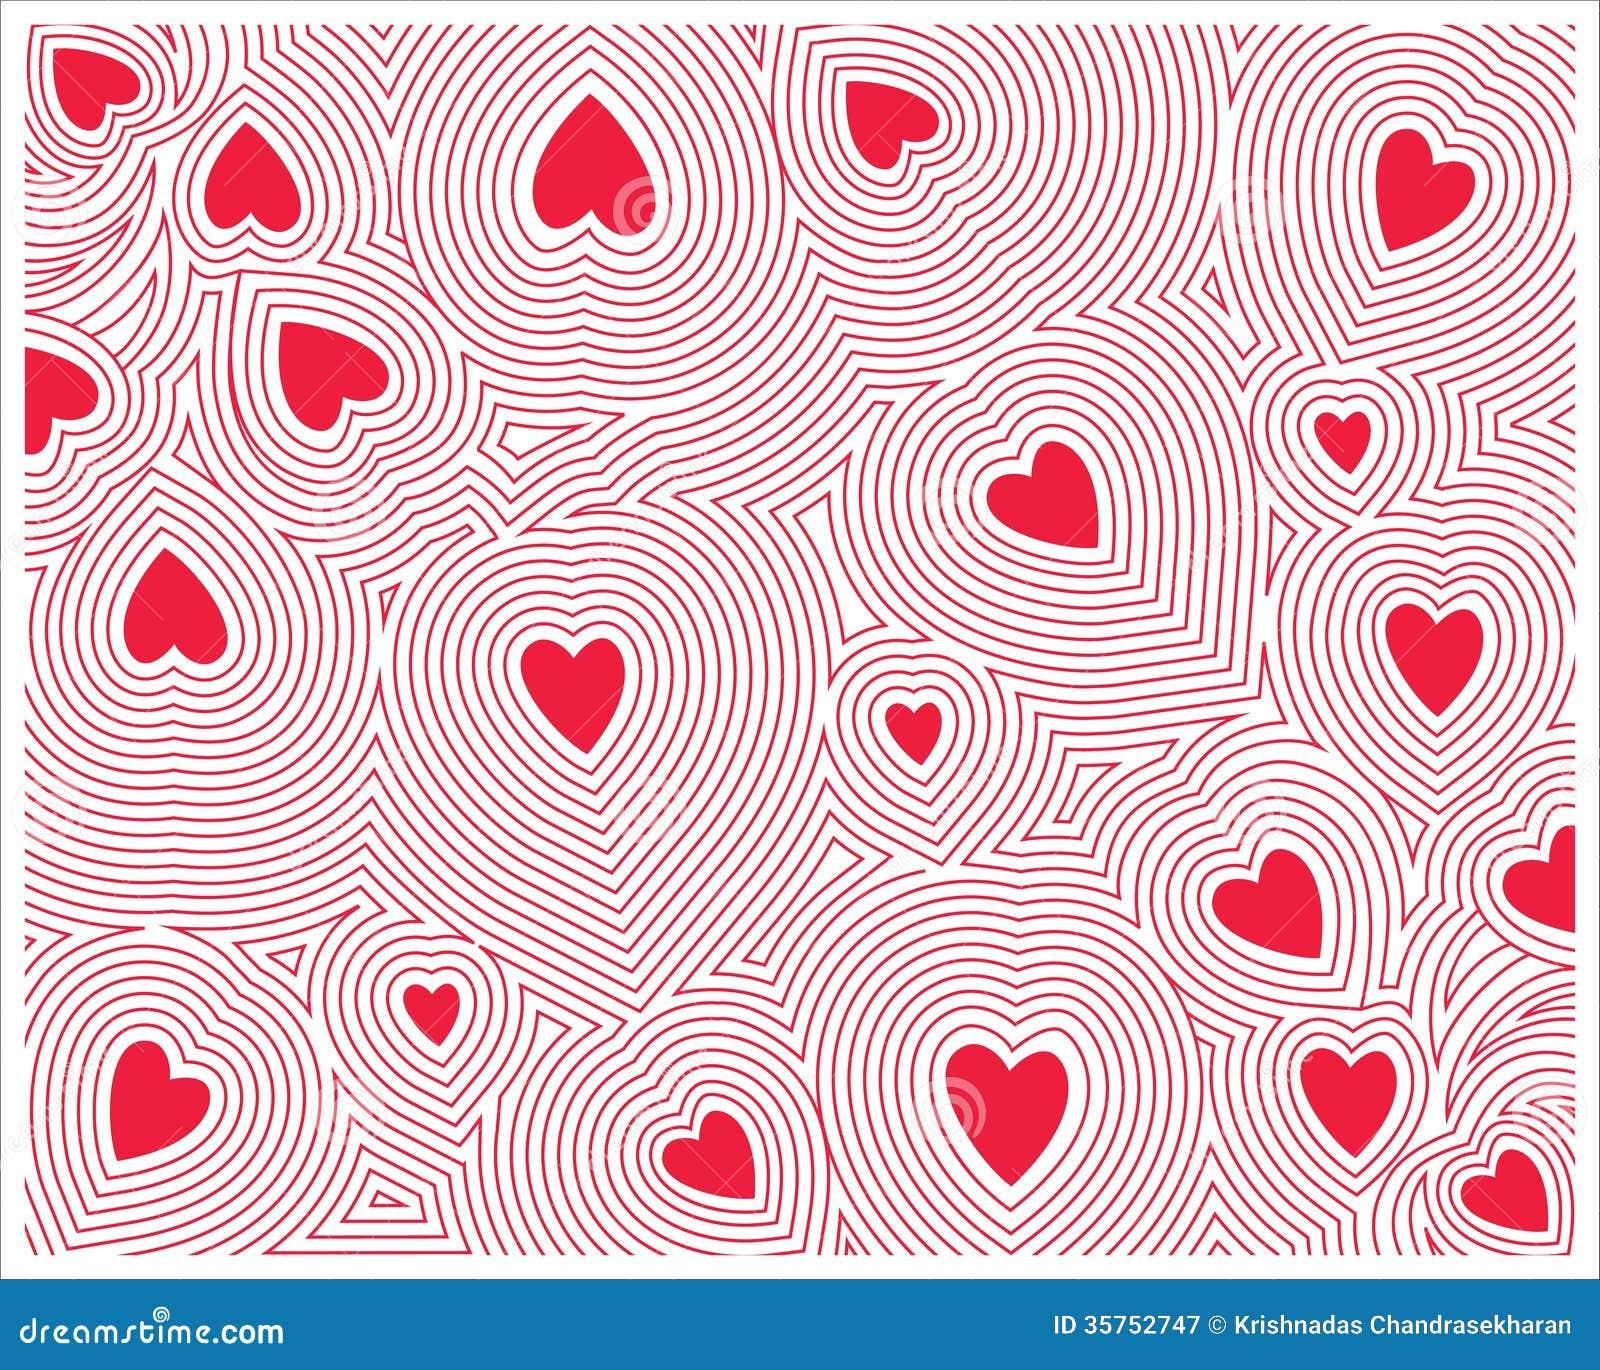 pretty heart designs wallpapers - photo #48